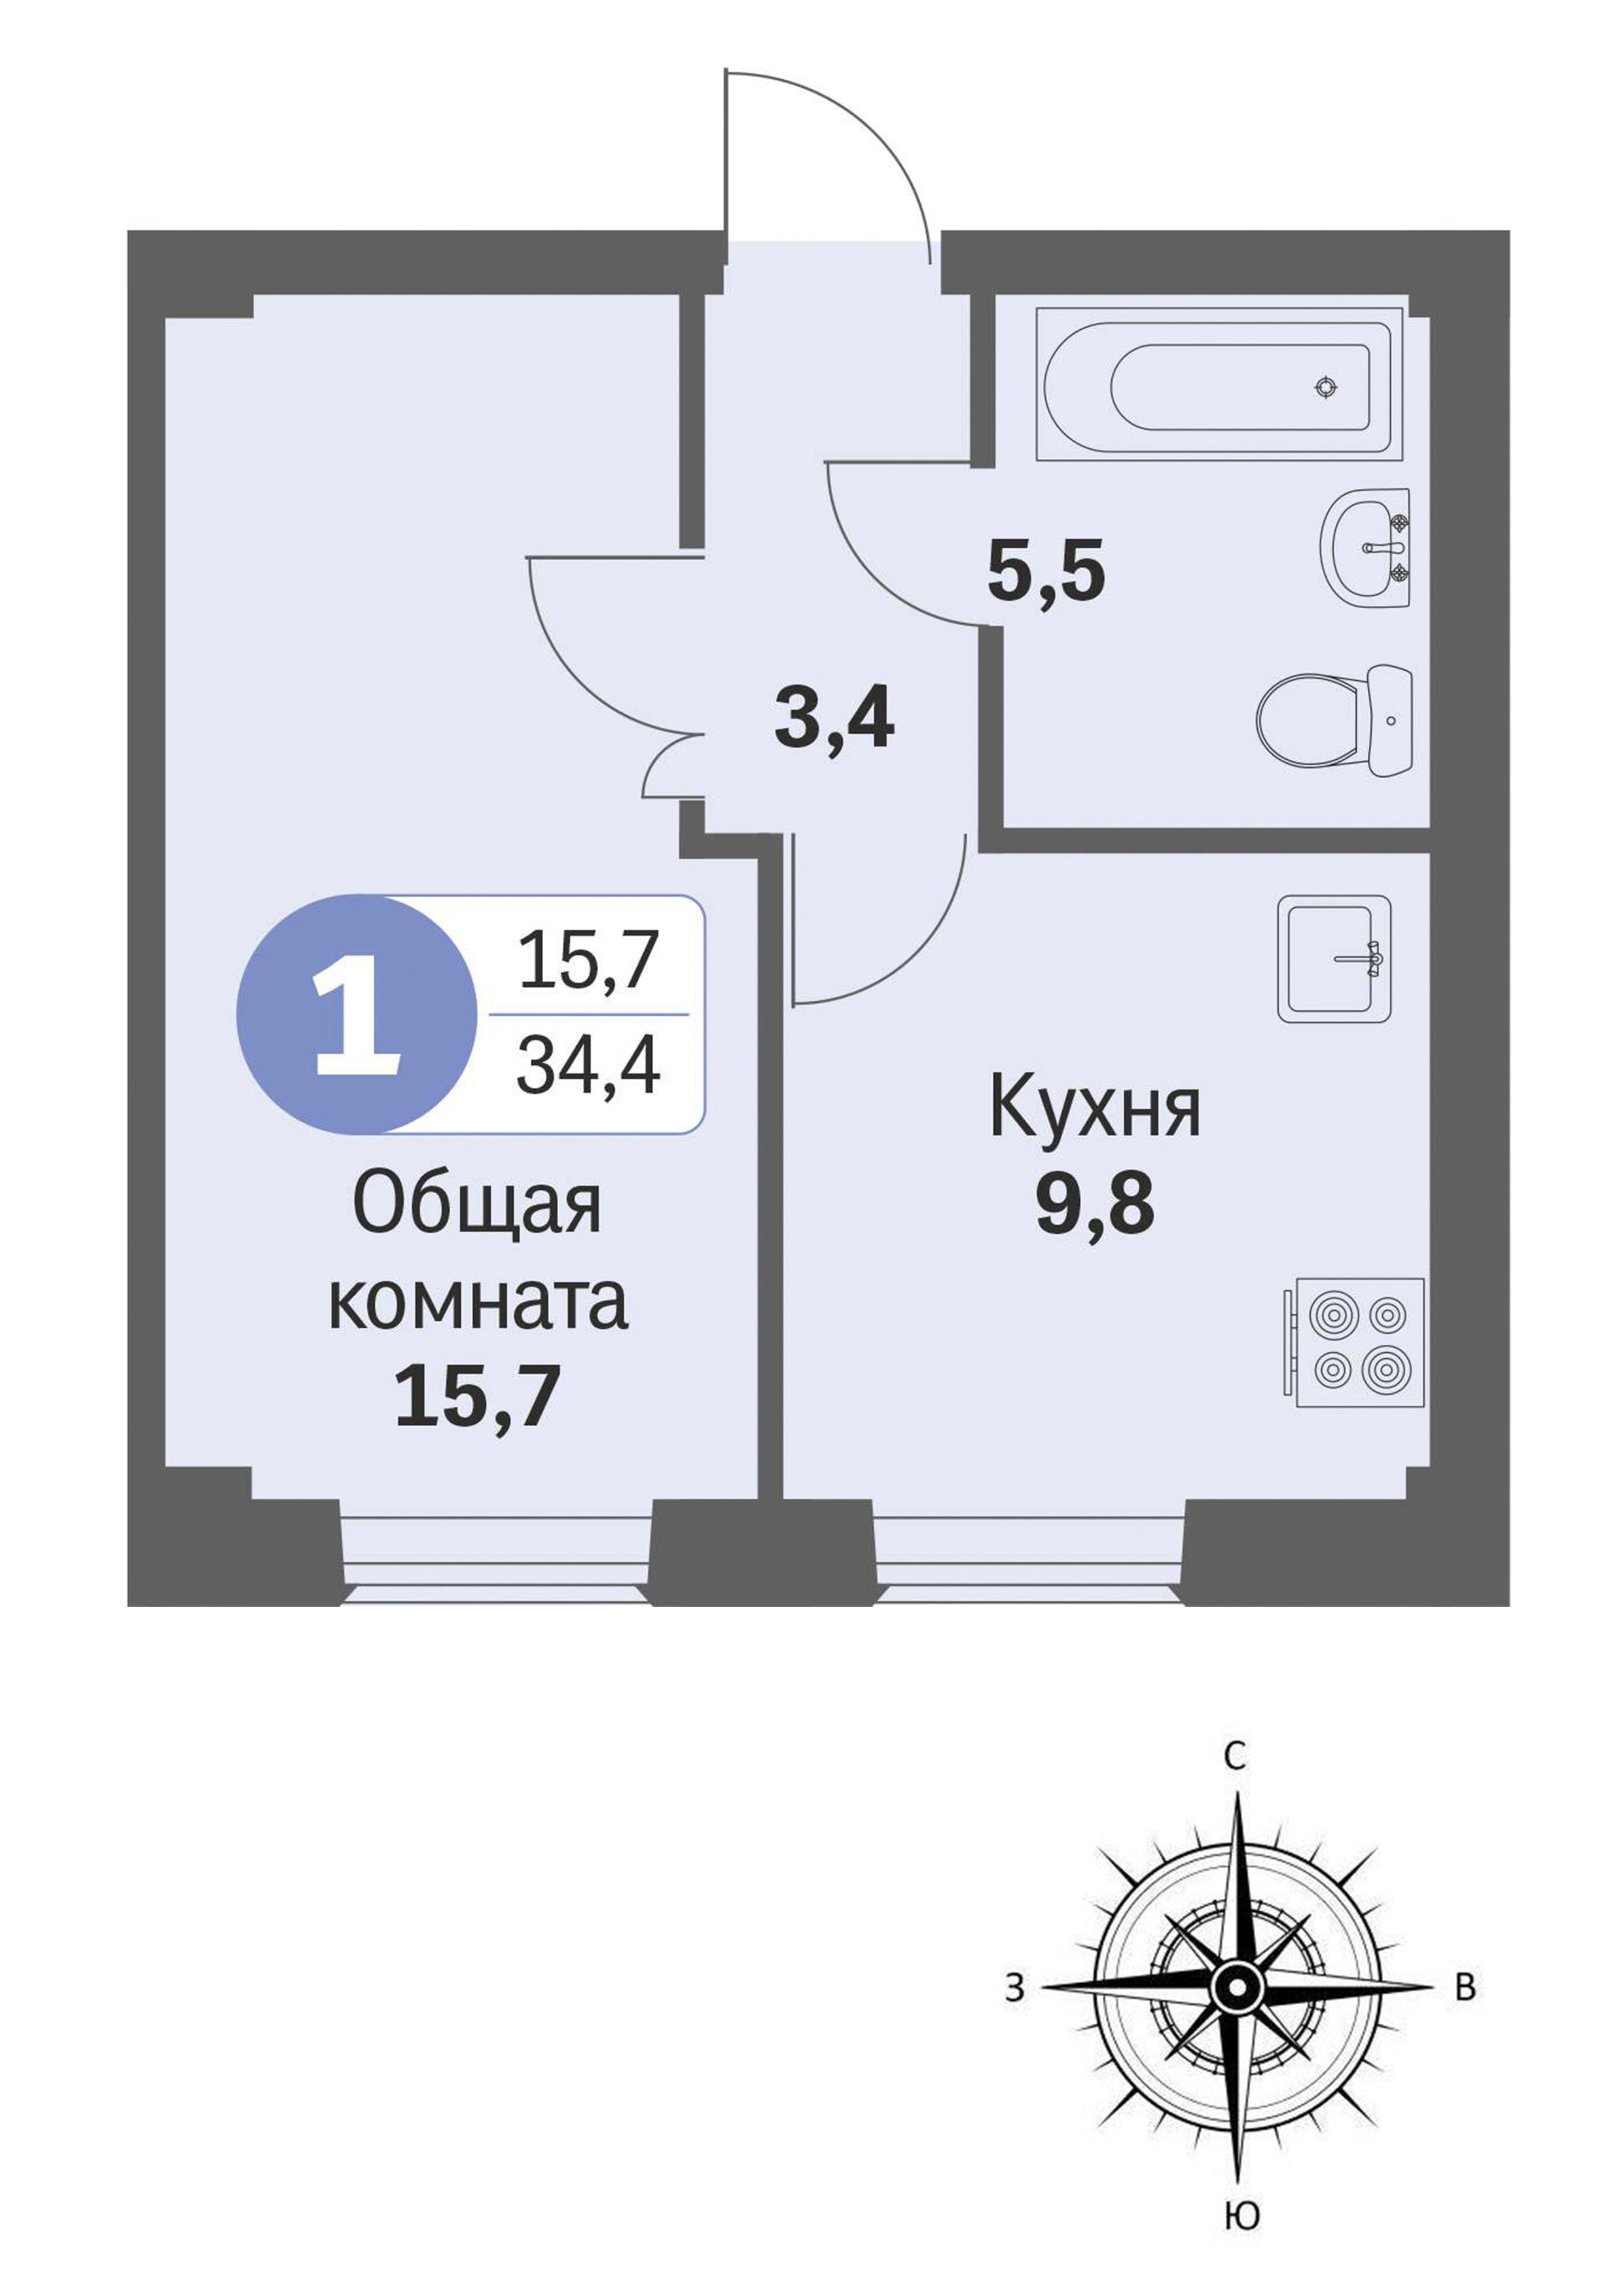 ул. Свиридова, 14, квартира 393 - Однокомнатная